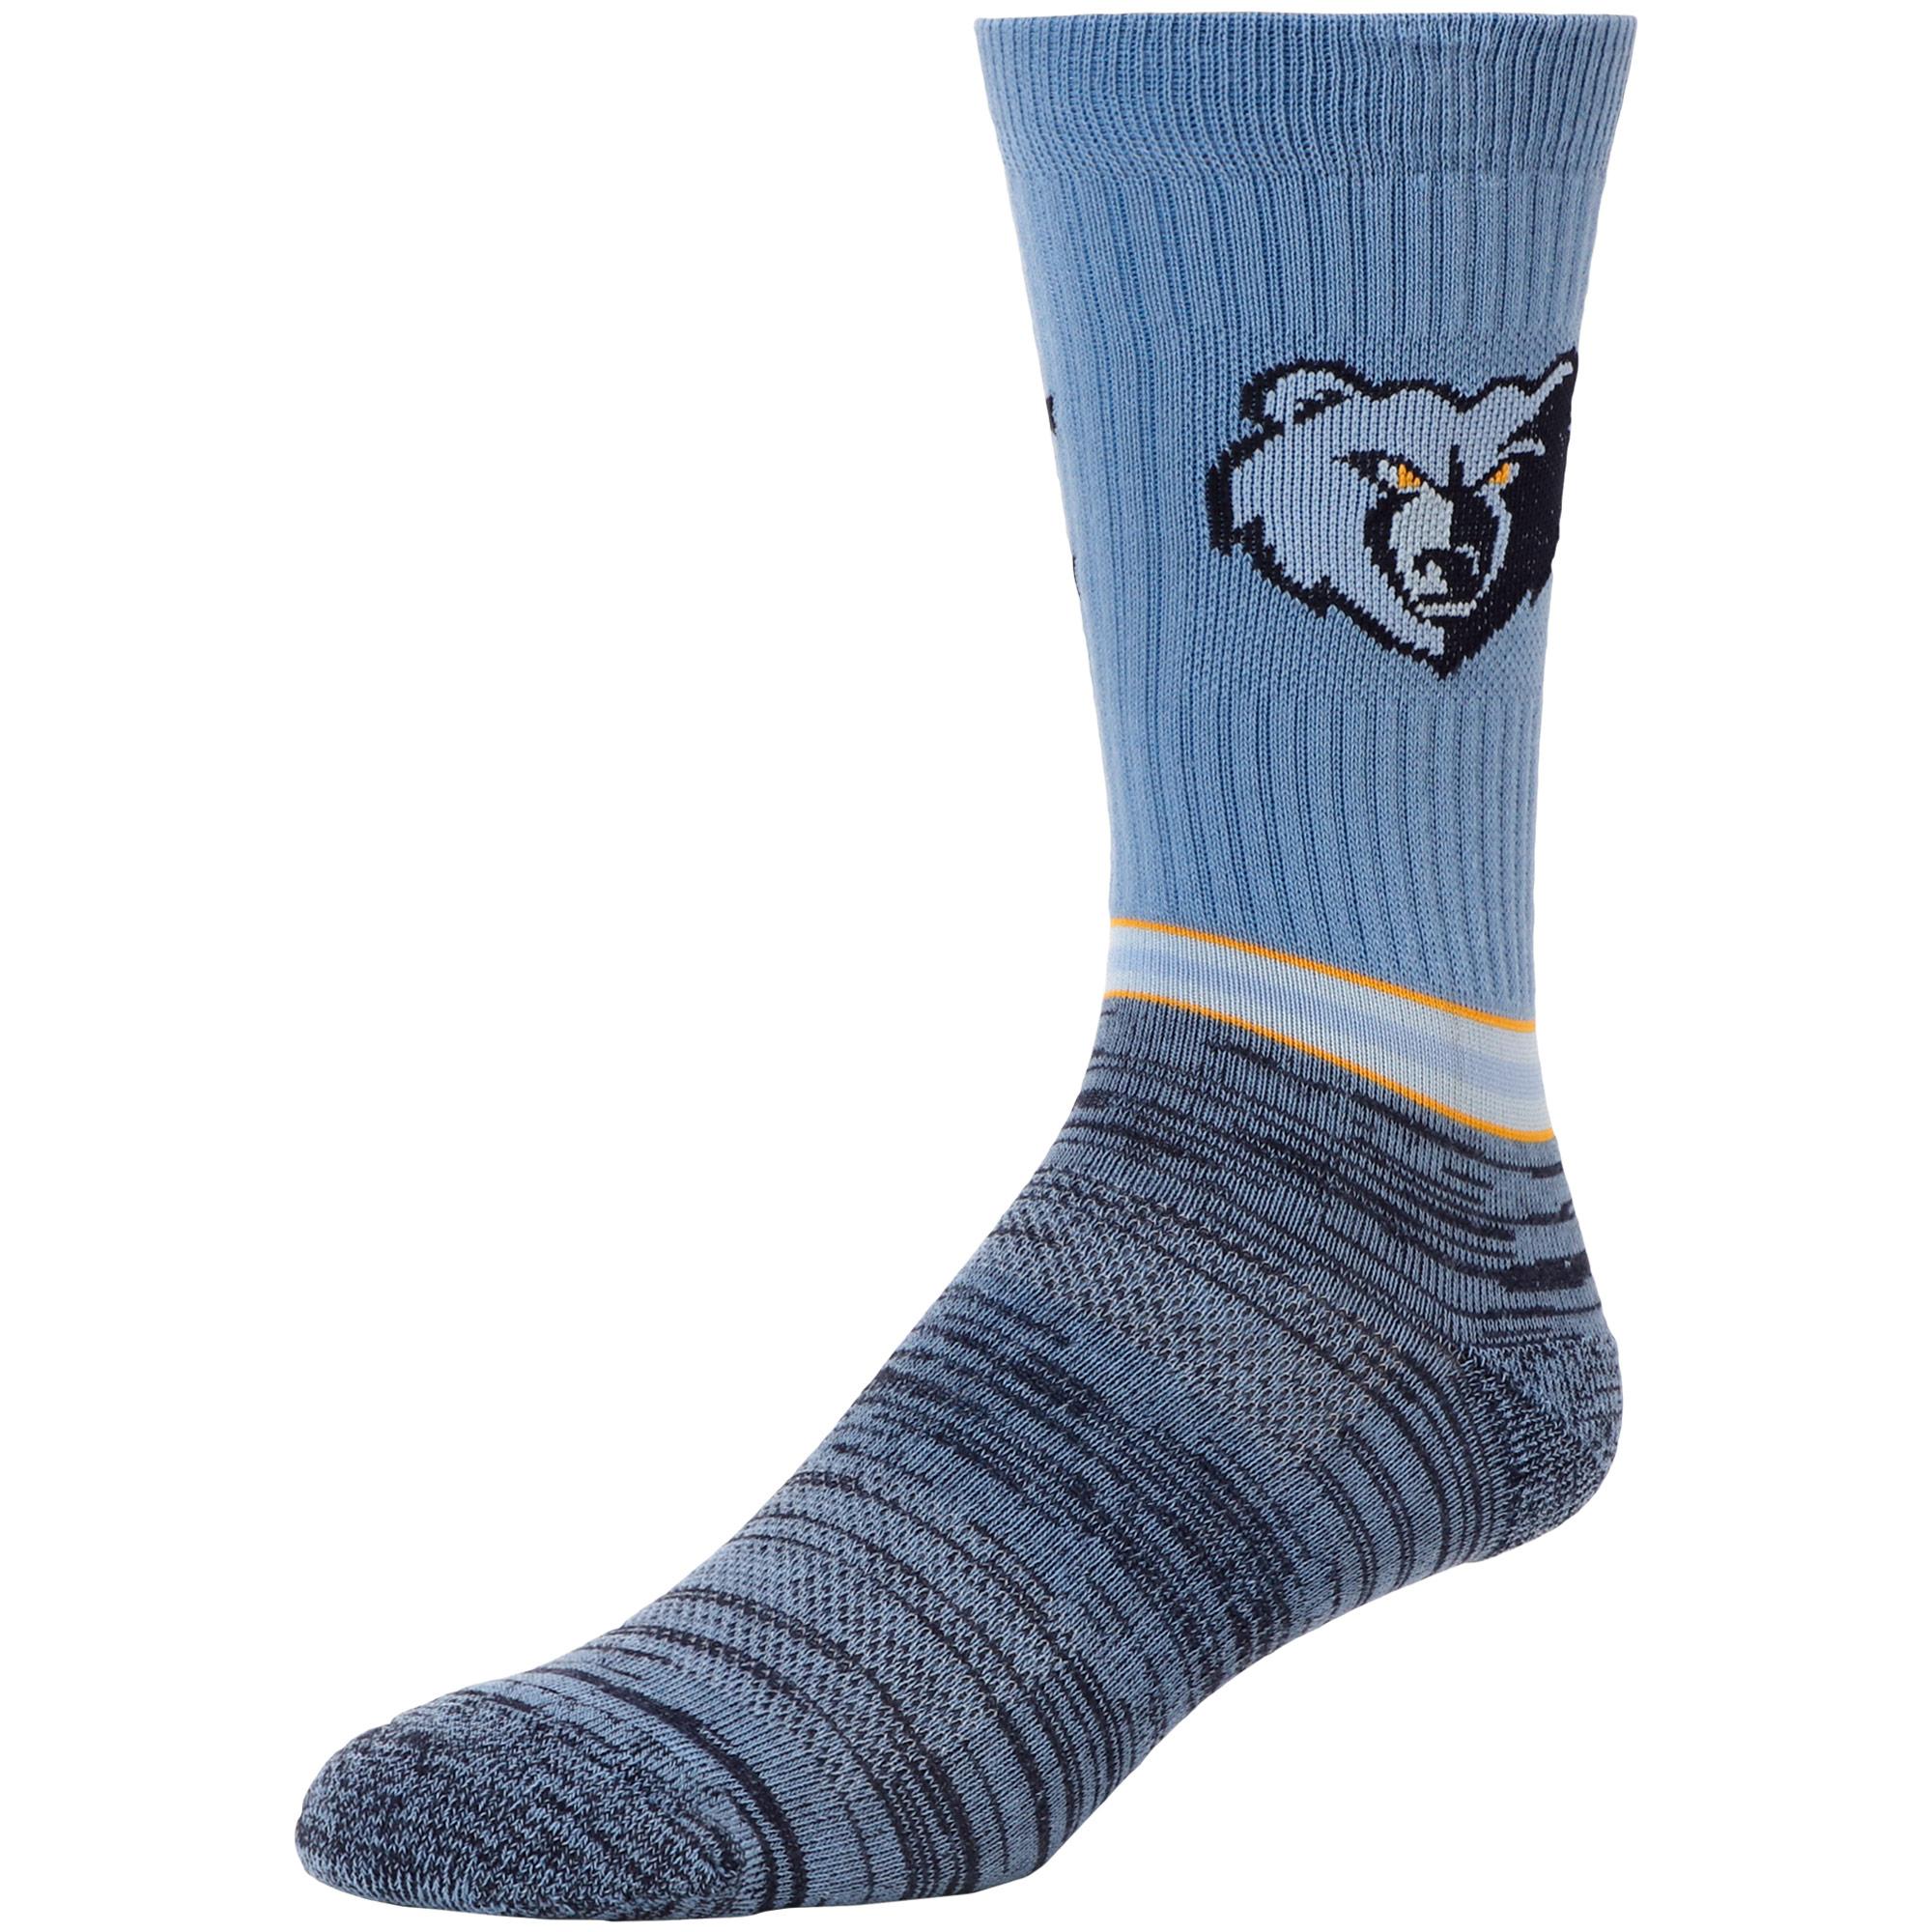 Memphis Grizzlies Block Crew Socks - L